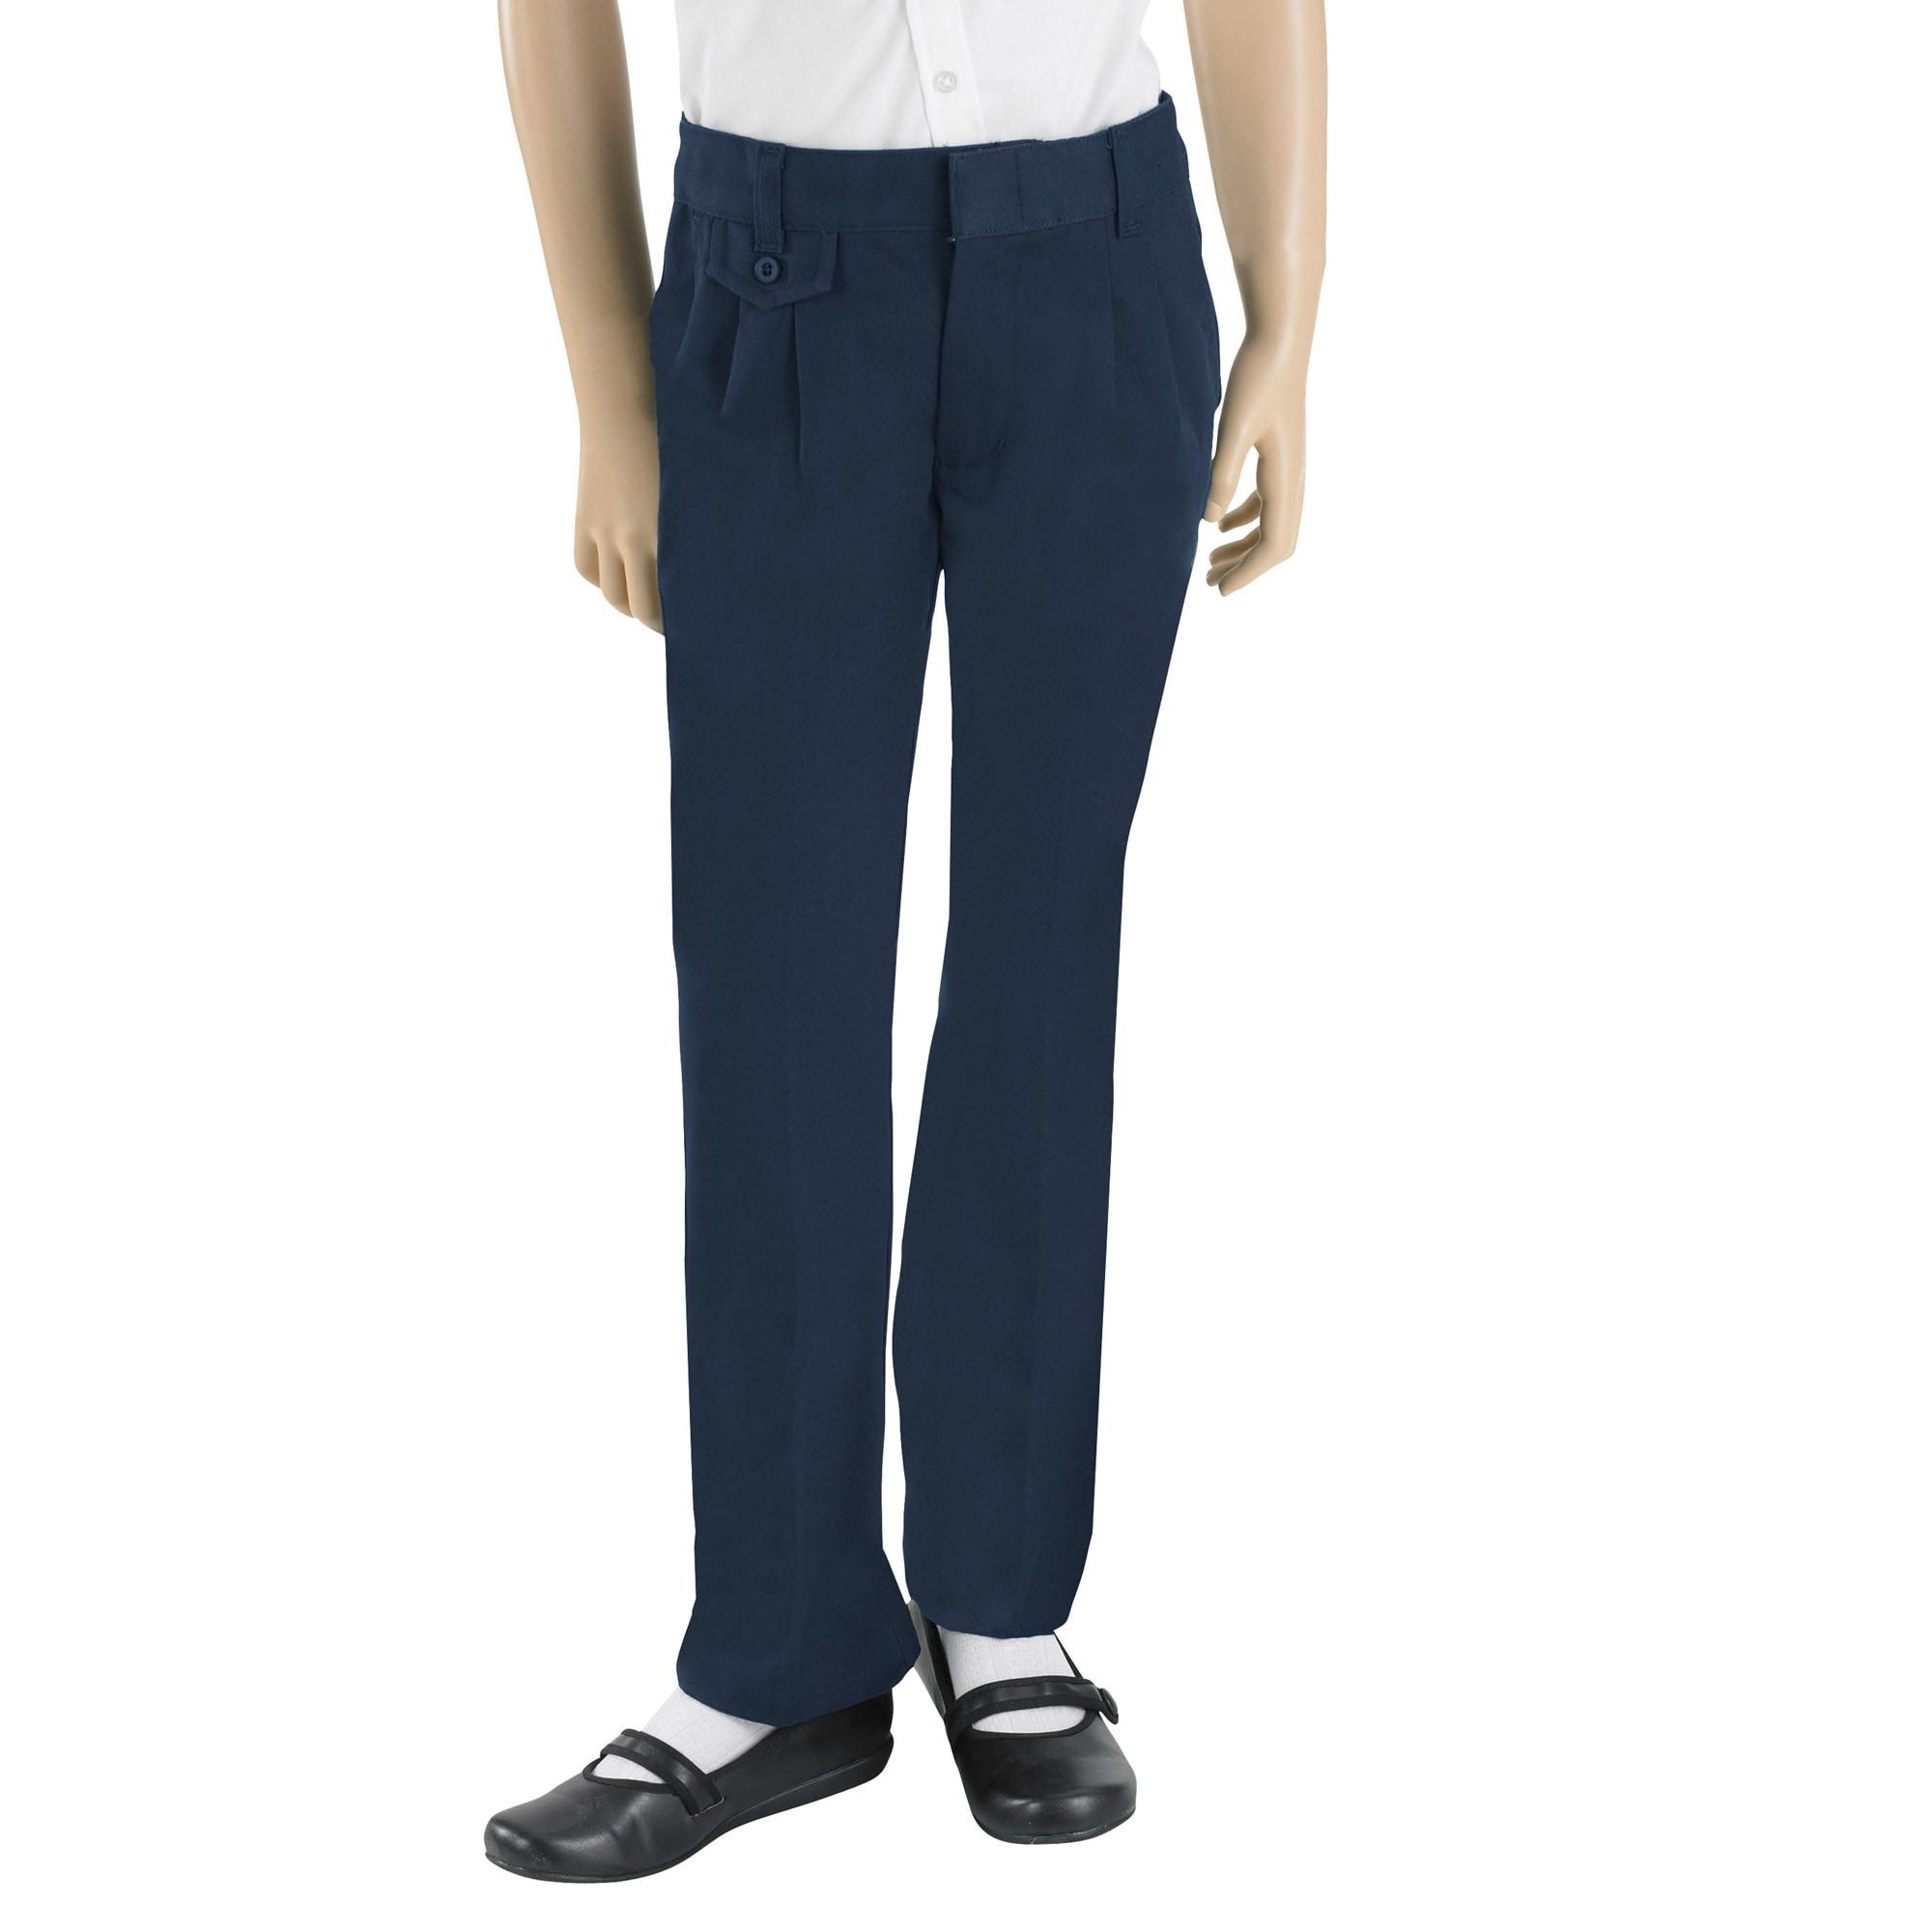 47dfb5c23d Thumbnail French Toast Girl's School Uniform Navy Twill Pants Size 4 (